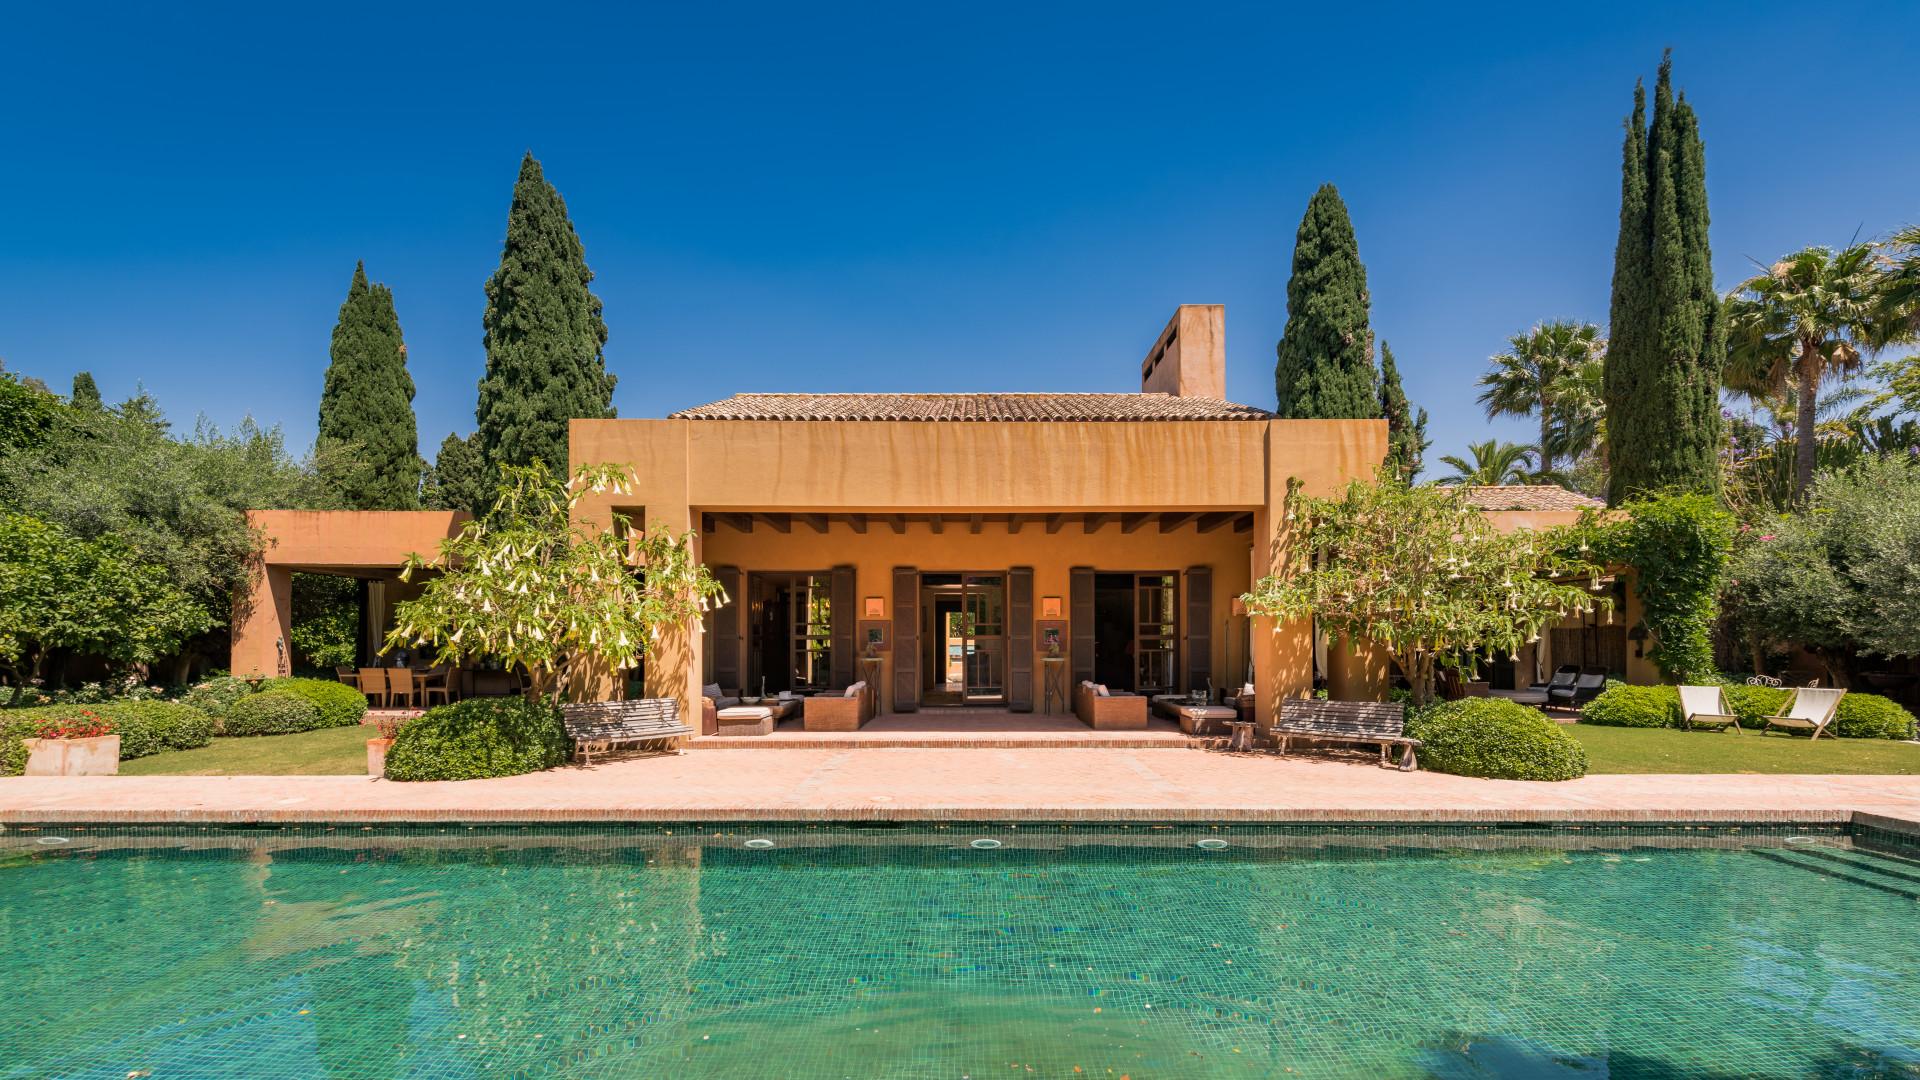 Superb villa in San Pedro de Alcantara with a masterpiece design